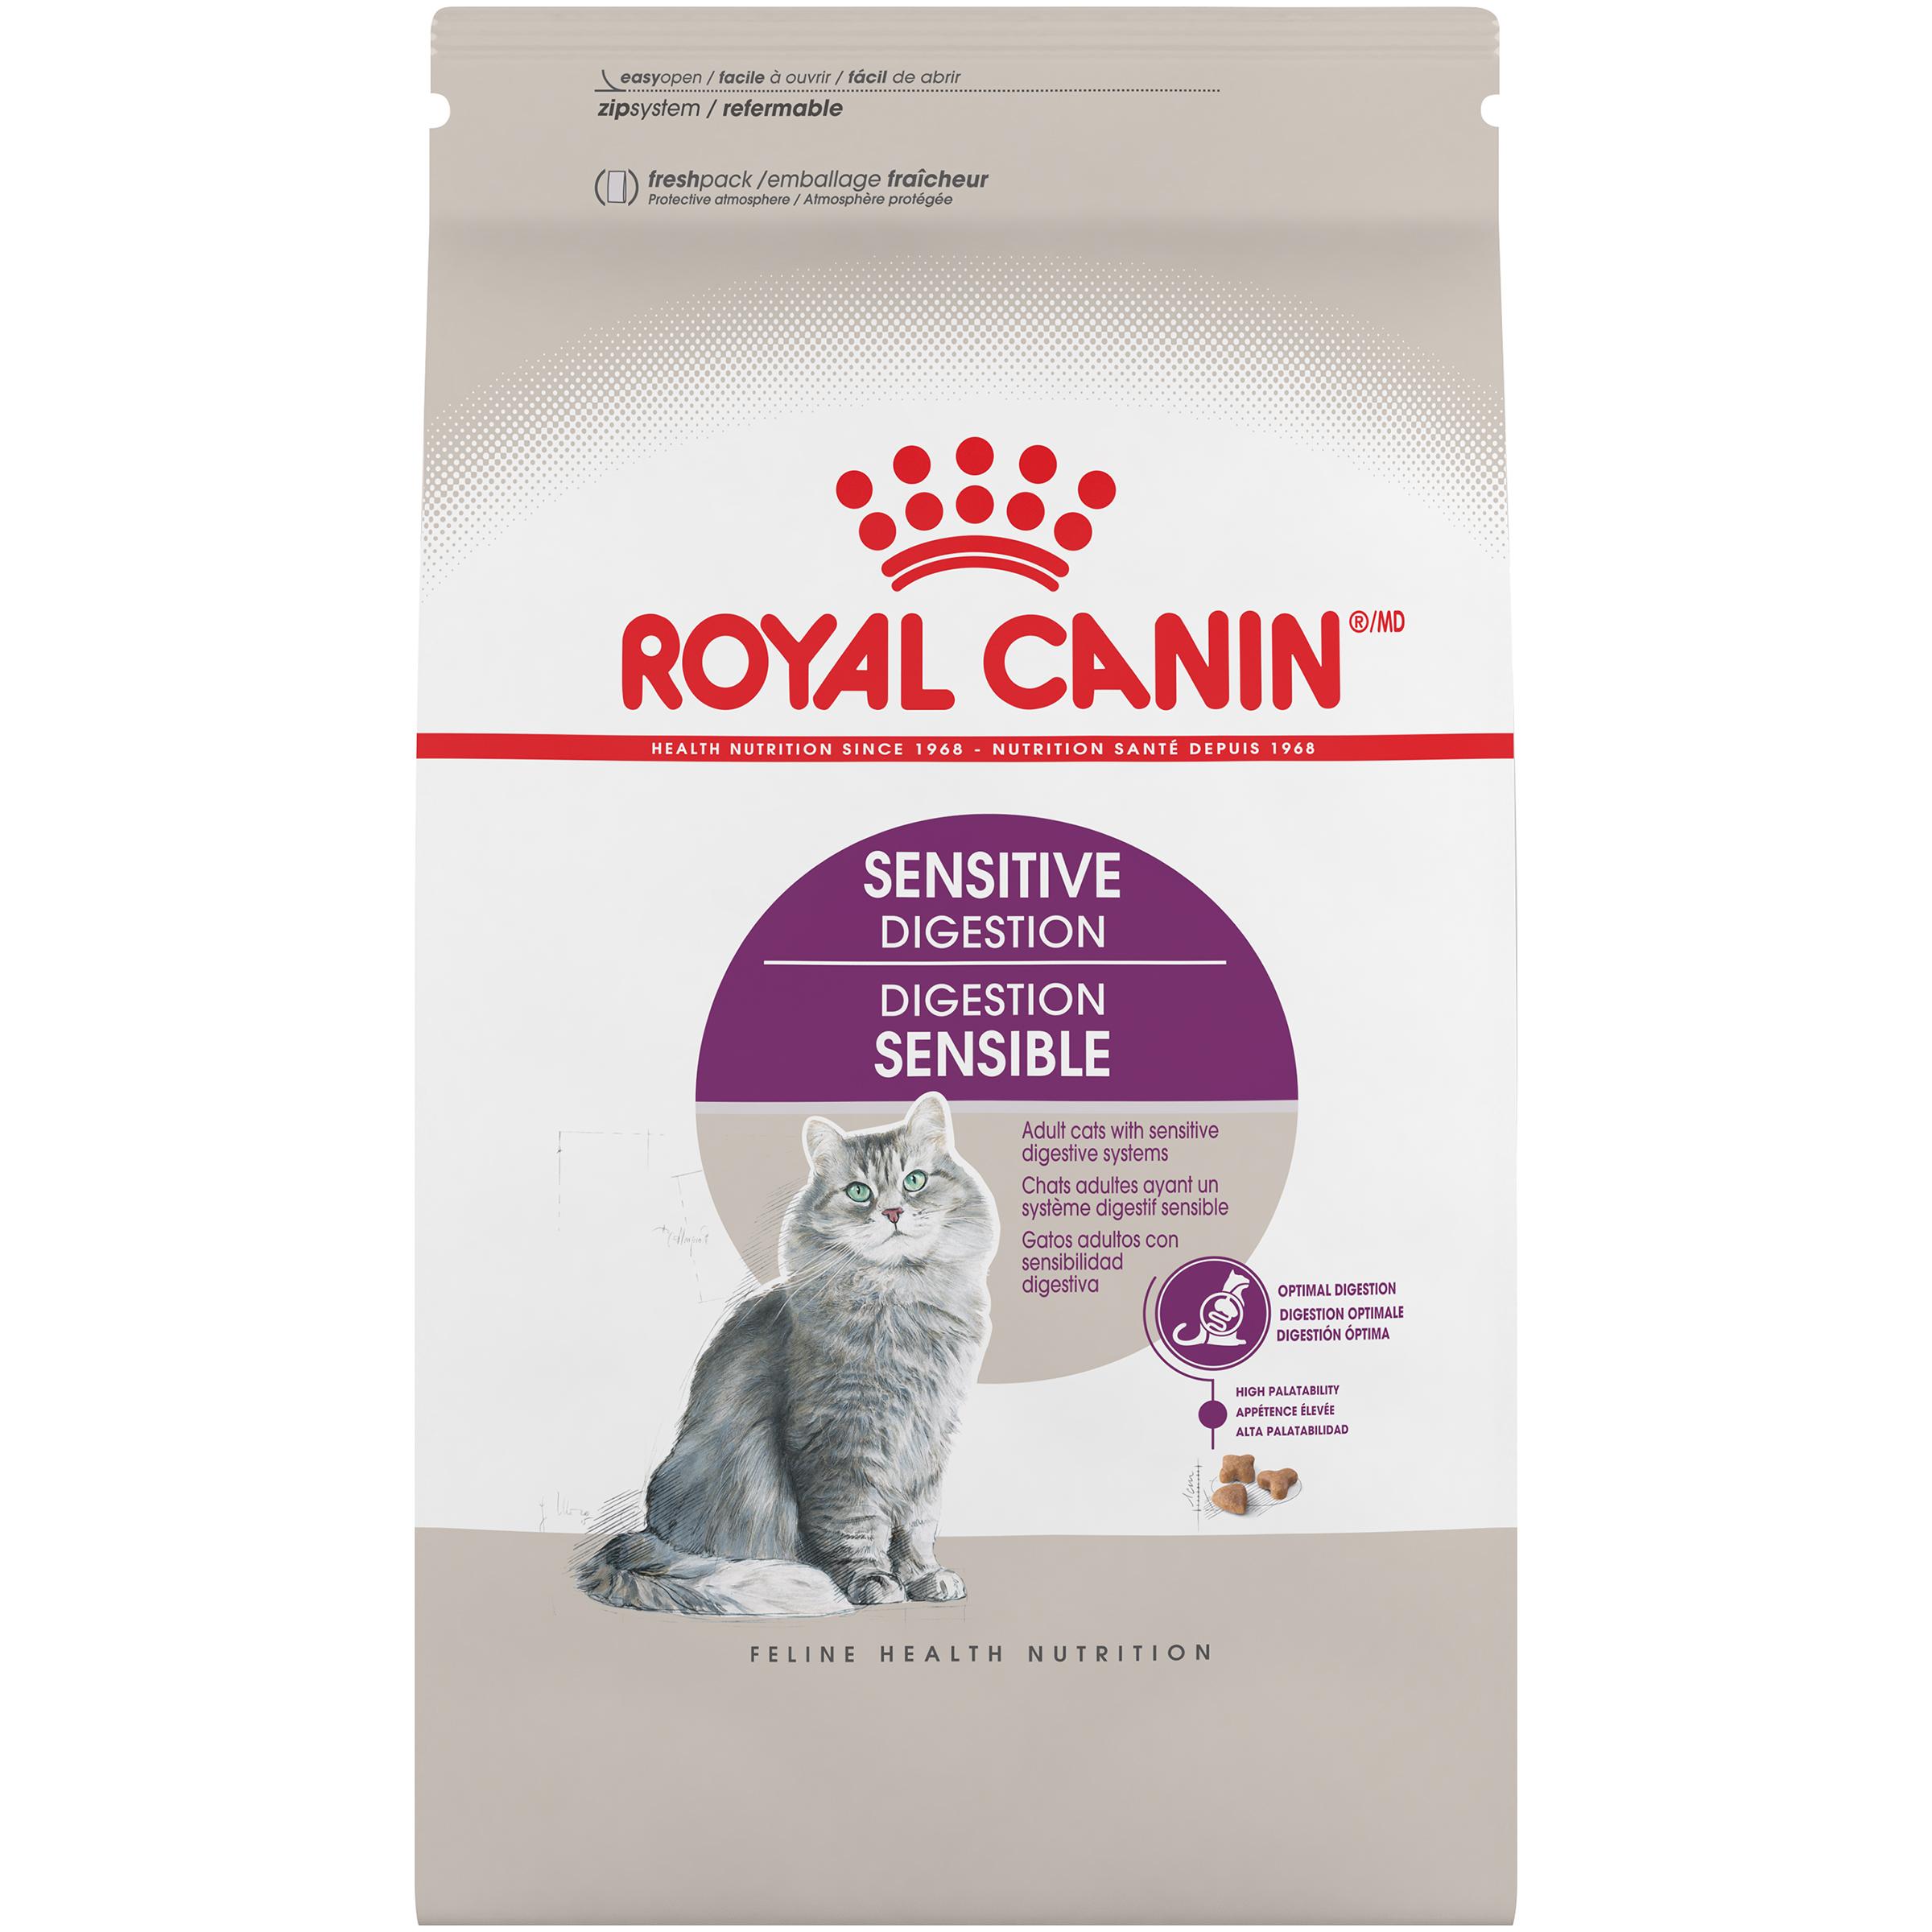 Sensitive Digestion Dry Adult Cat Food